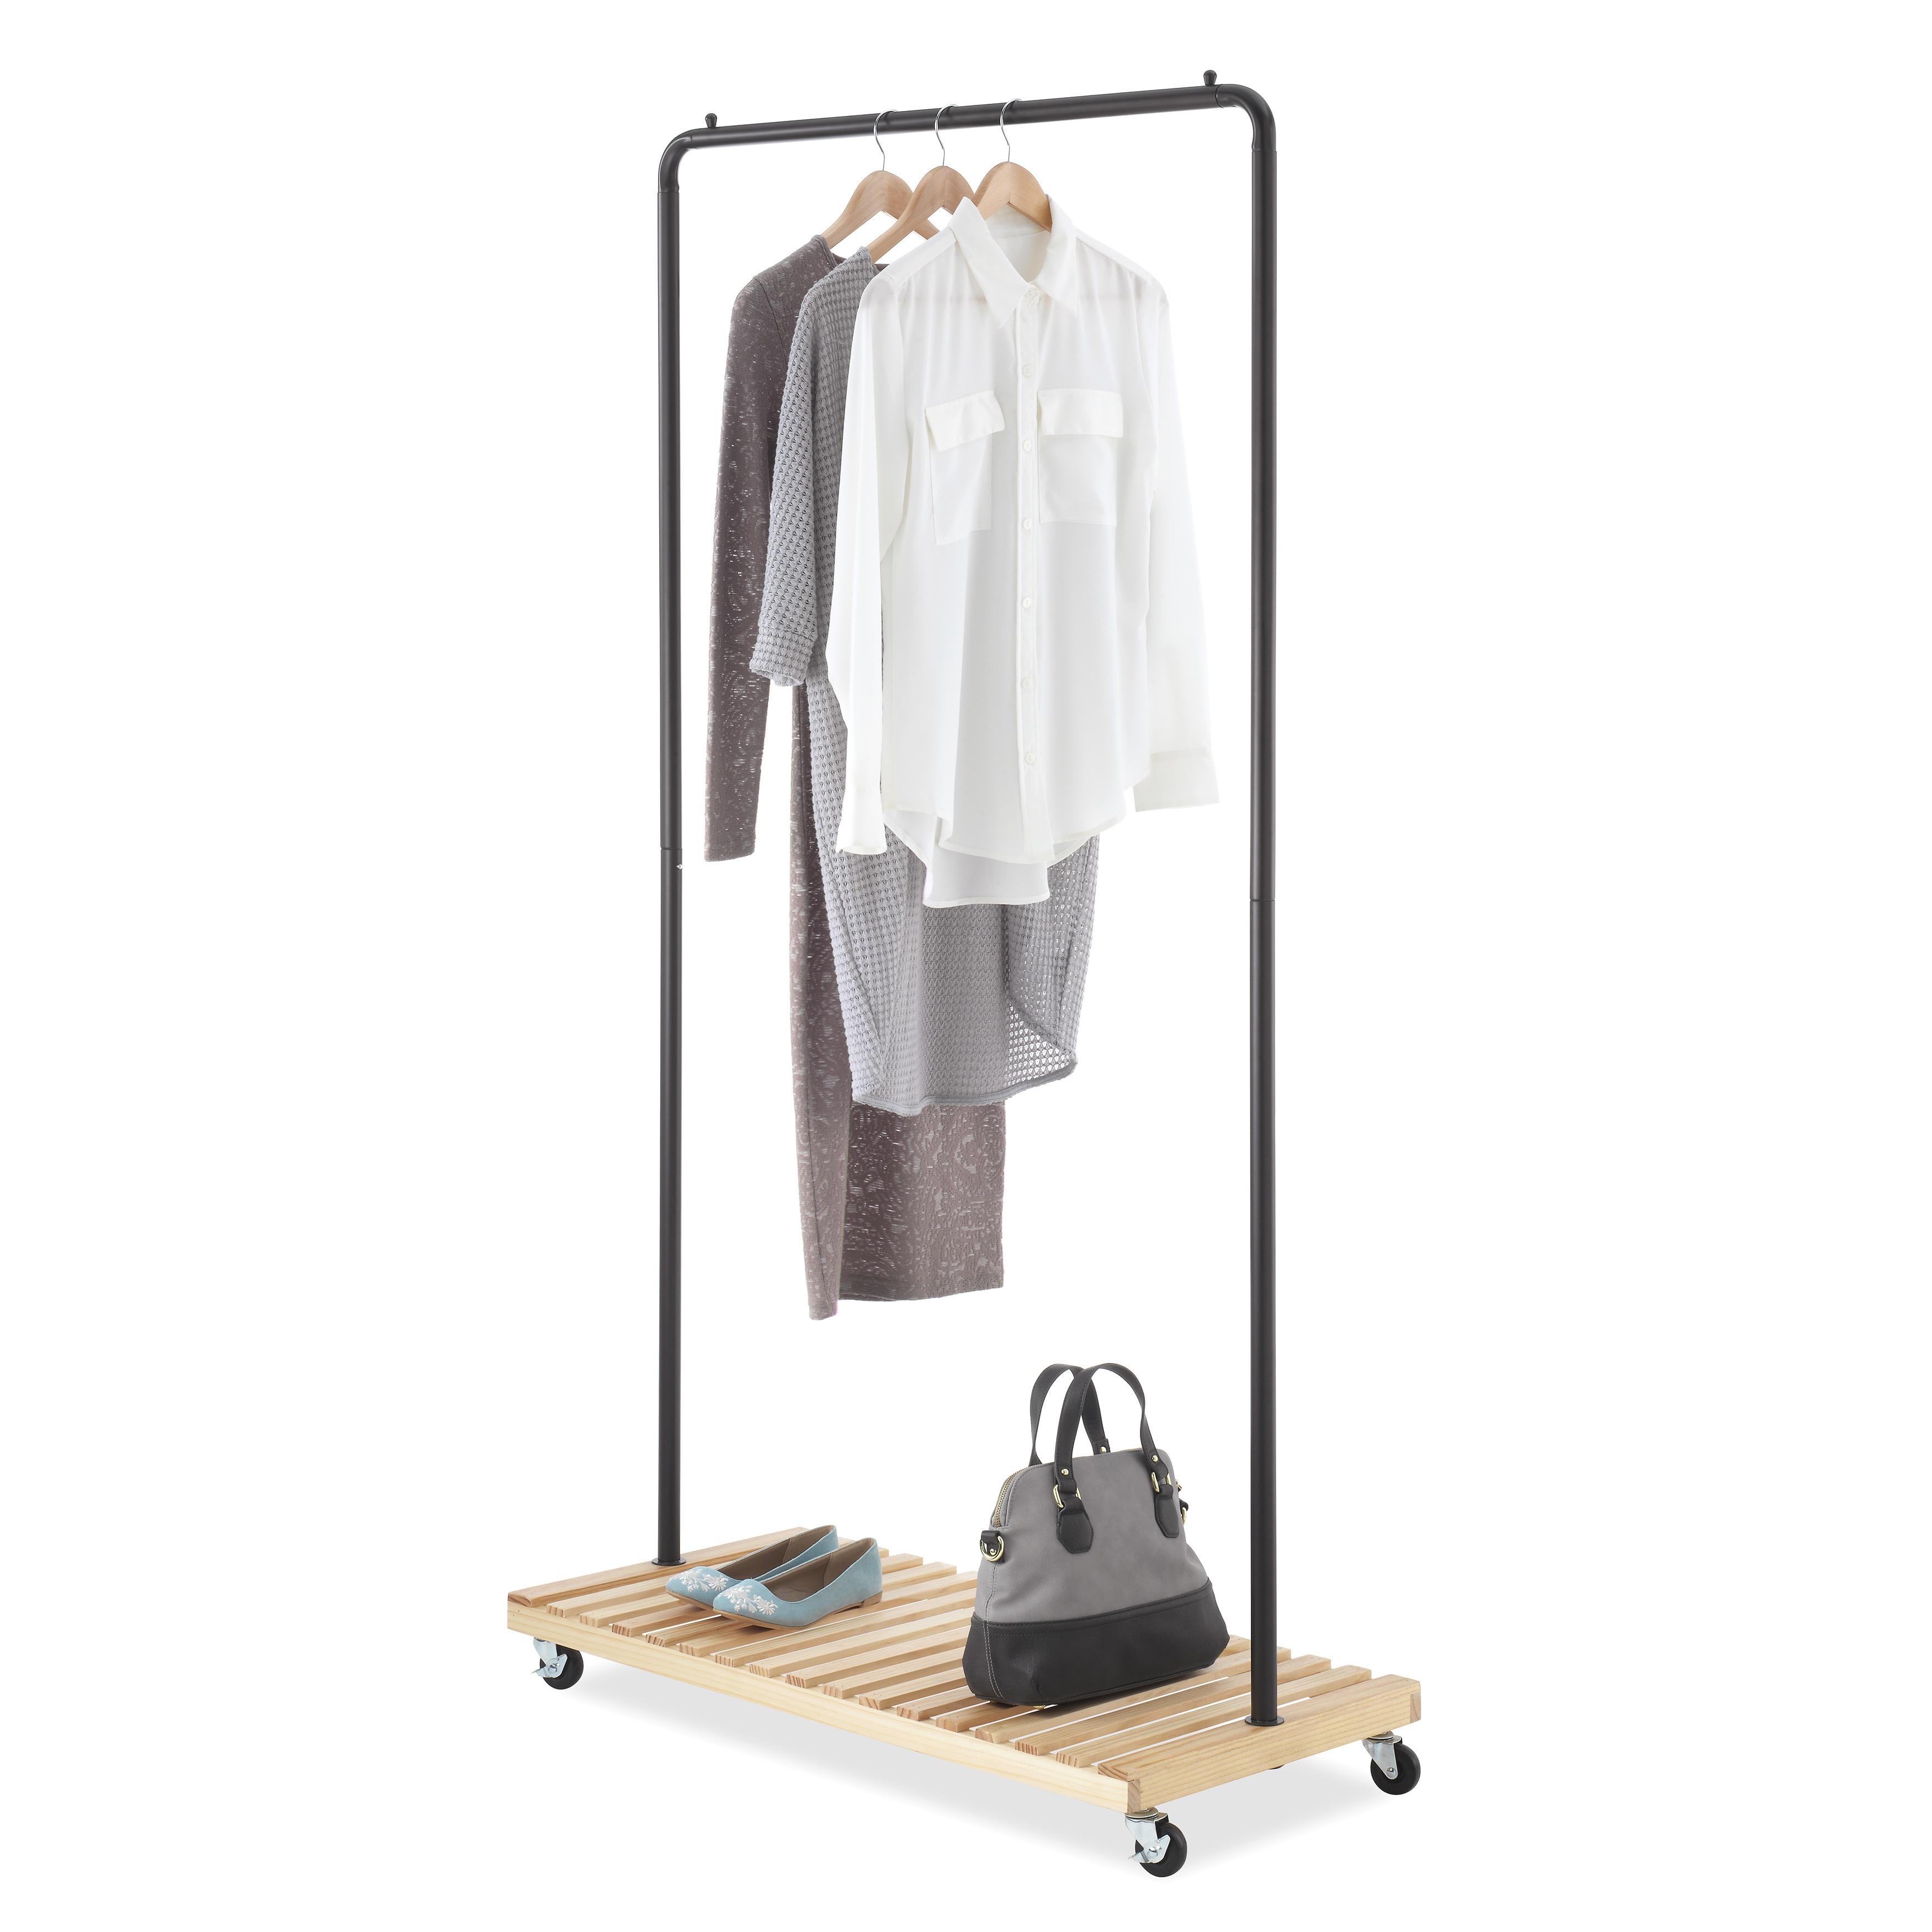 Whitmor 6301-5236-BB Slat Wood Garment Rack - Free Shipping Today -  Overstock.com - 17548454